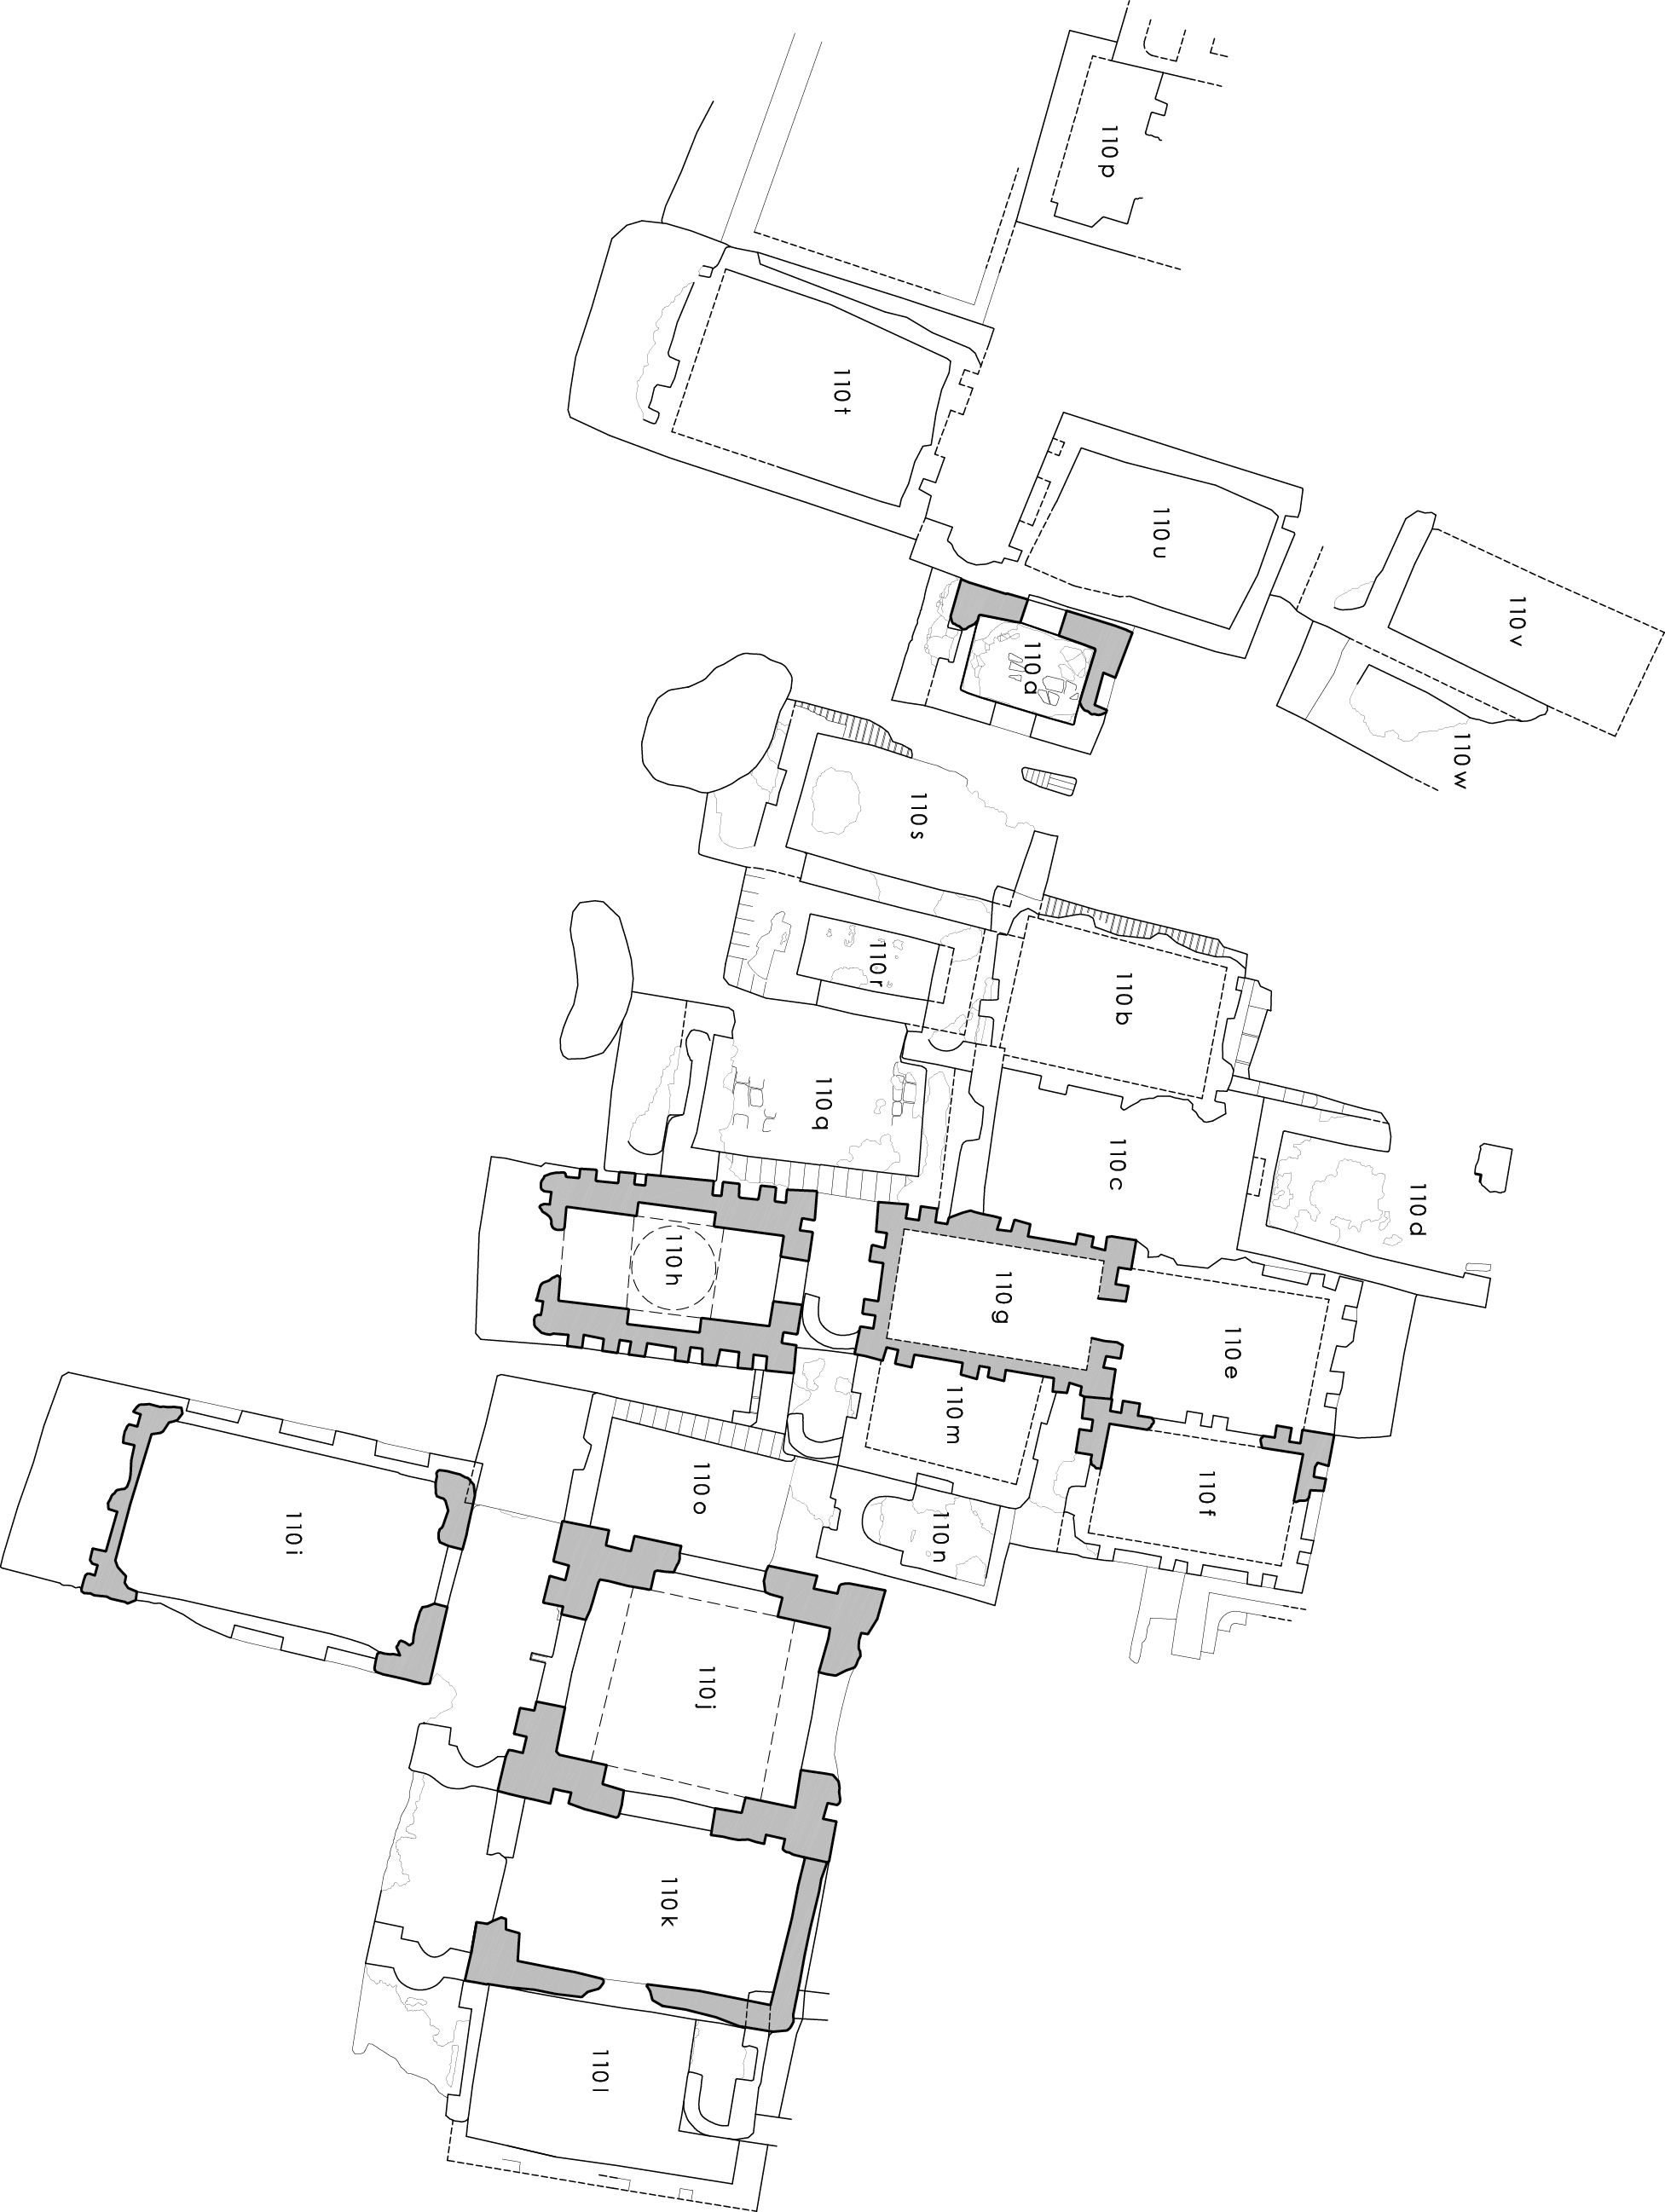 The South Necropolis Of Fatimid Cemetery Aswan Romans 8 Block Diagram Agrandir